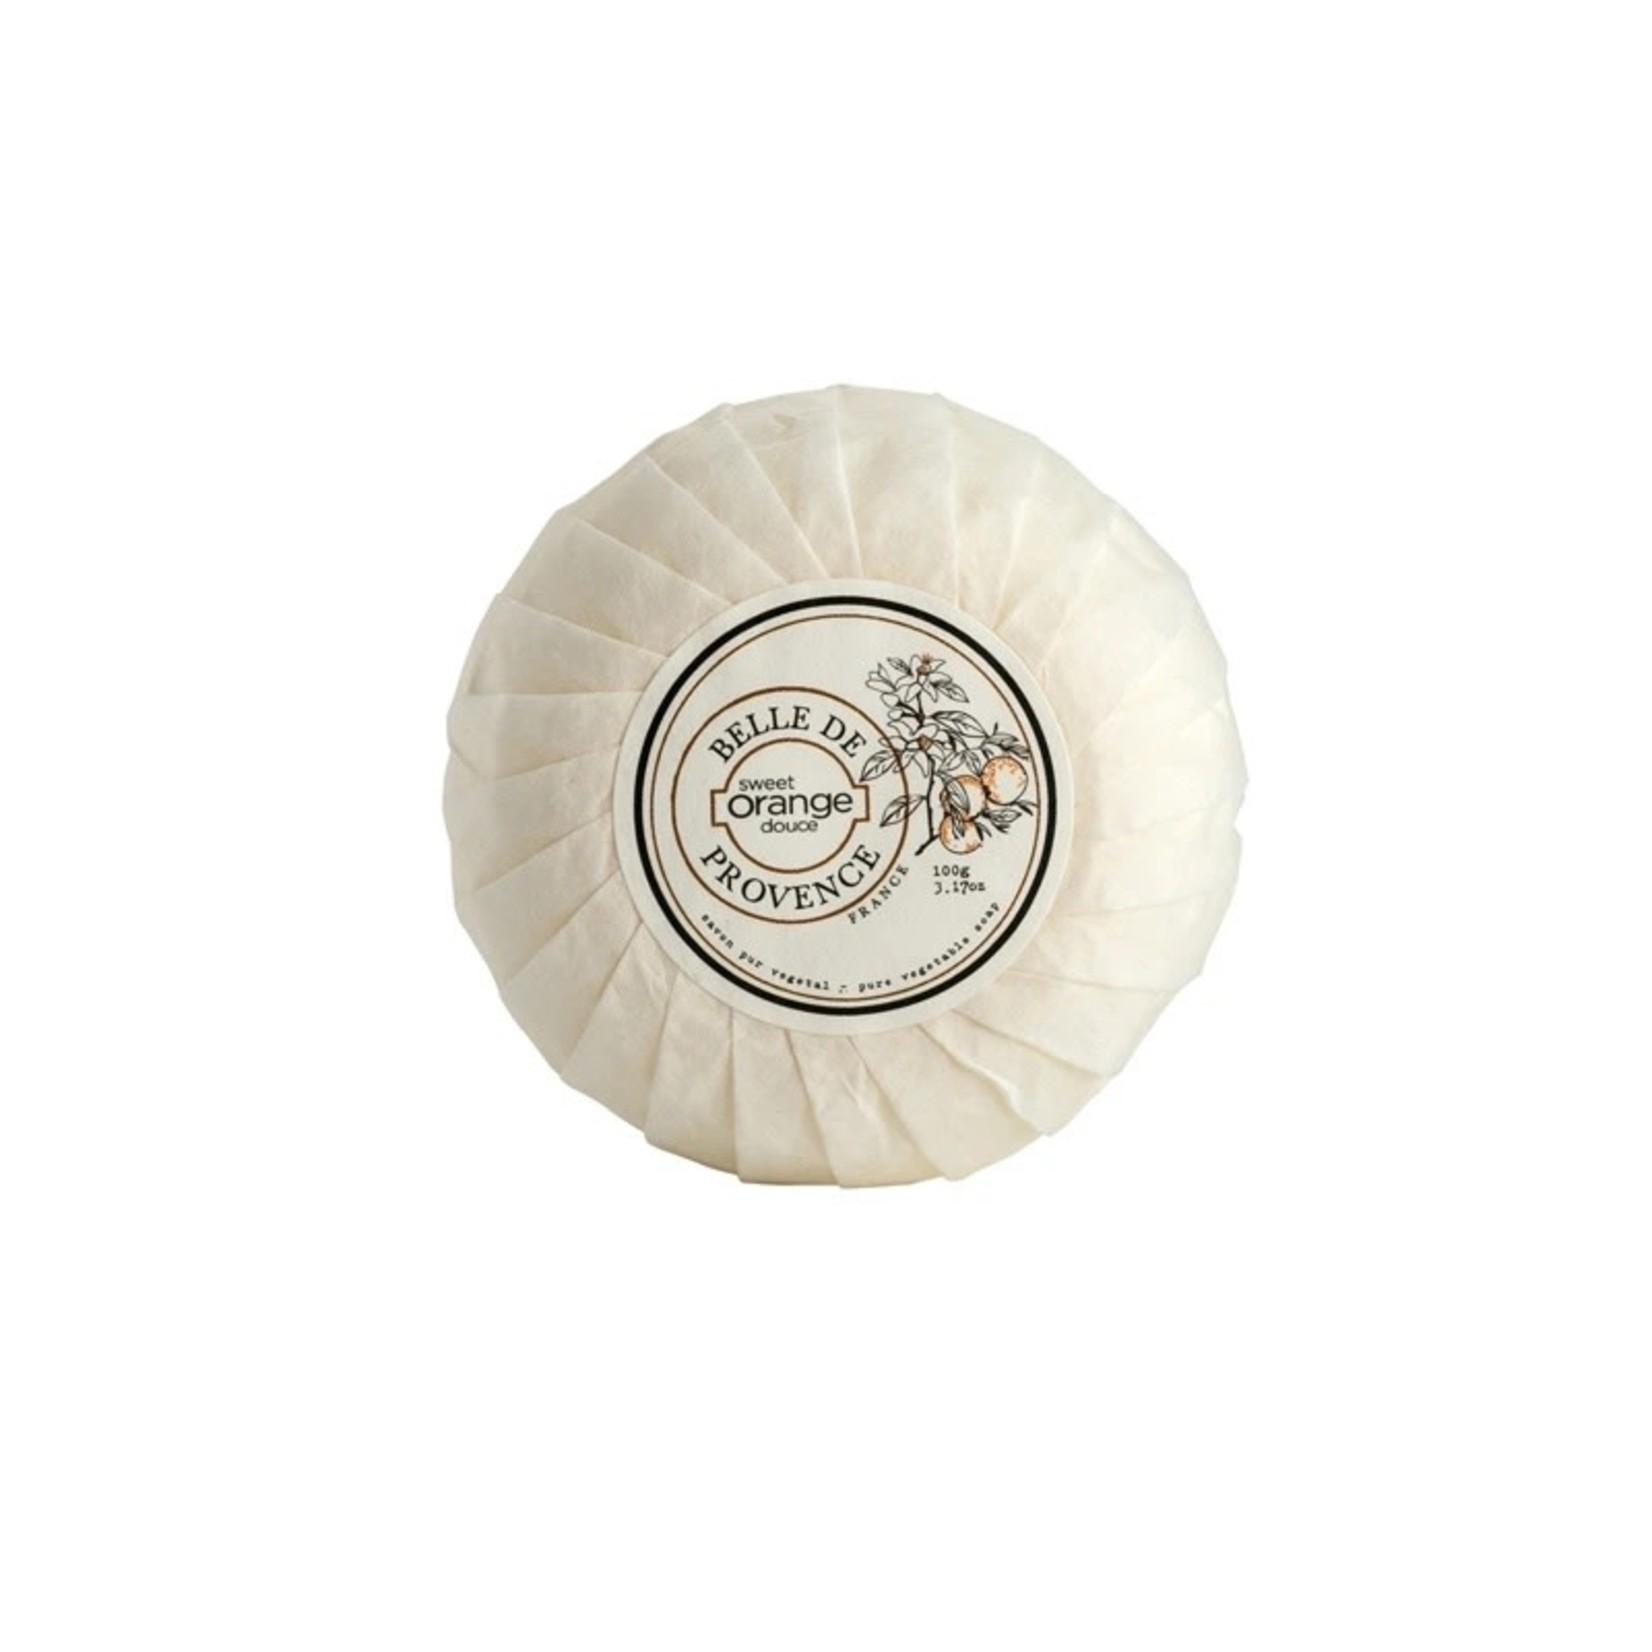 Belle de Provence Sweet Orange Soap